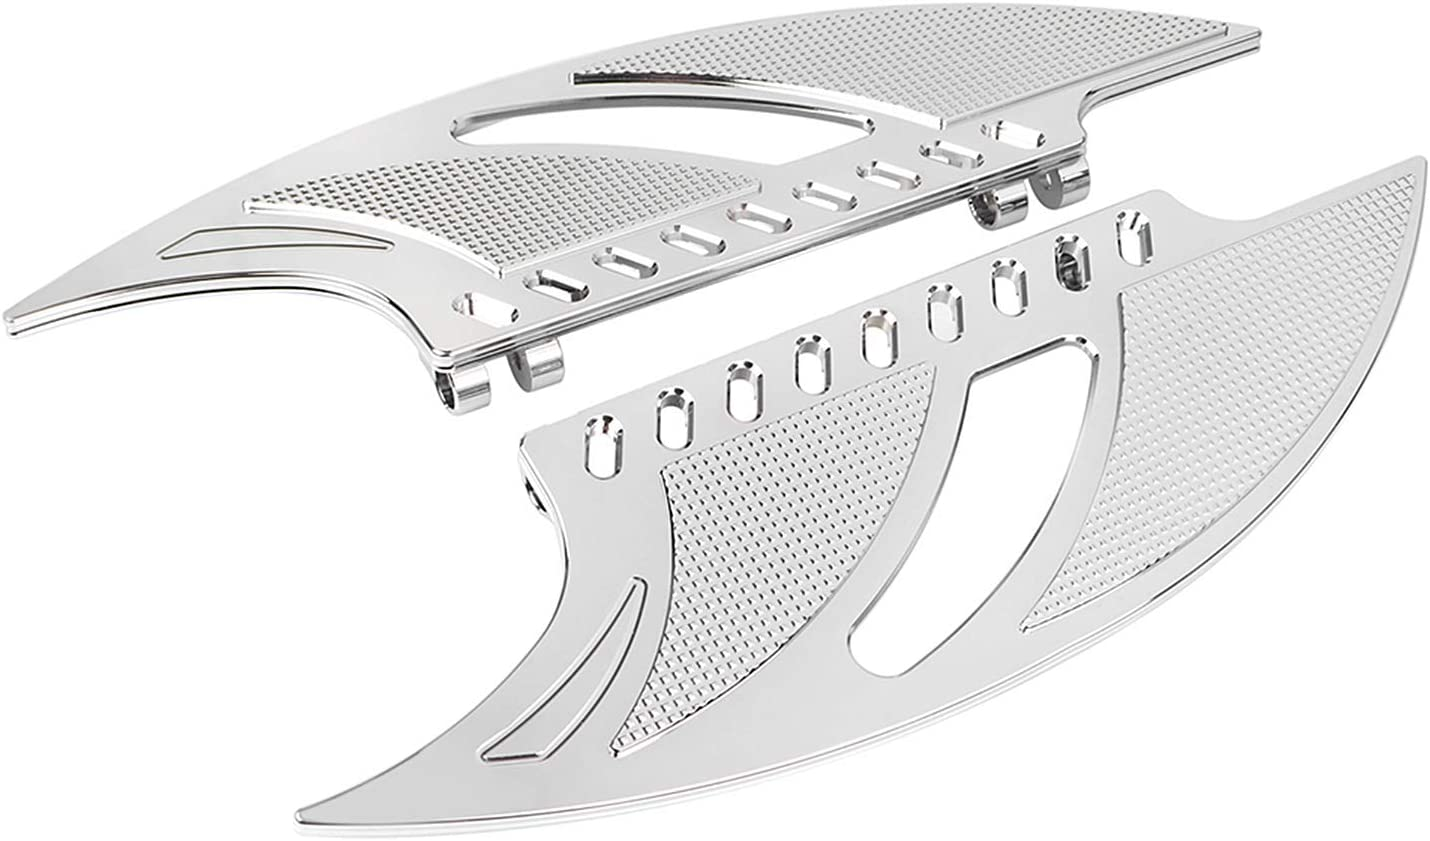 XMMT Repose-pieds avant en aluminium chrom/é CNC pour Harley Touring Electra Glide Street Glide Road King.